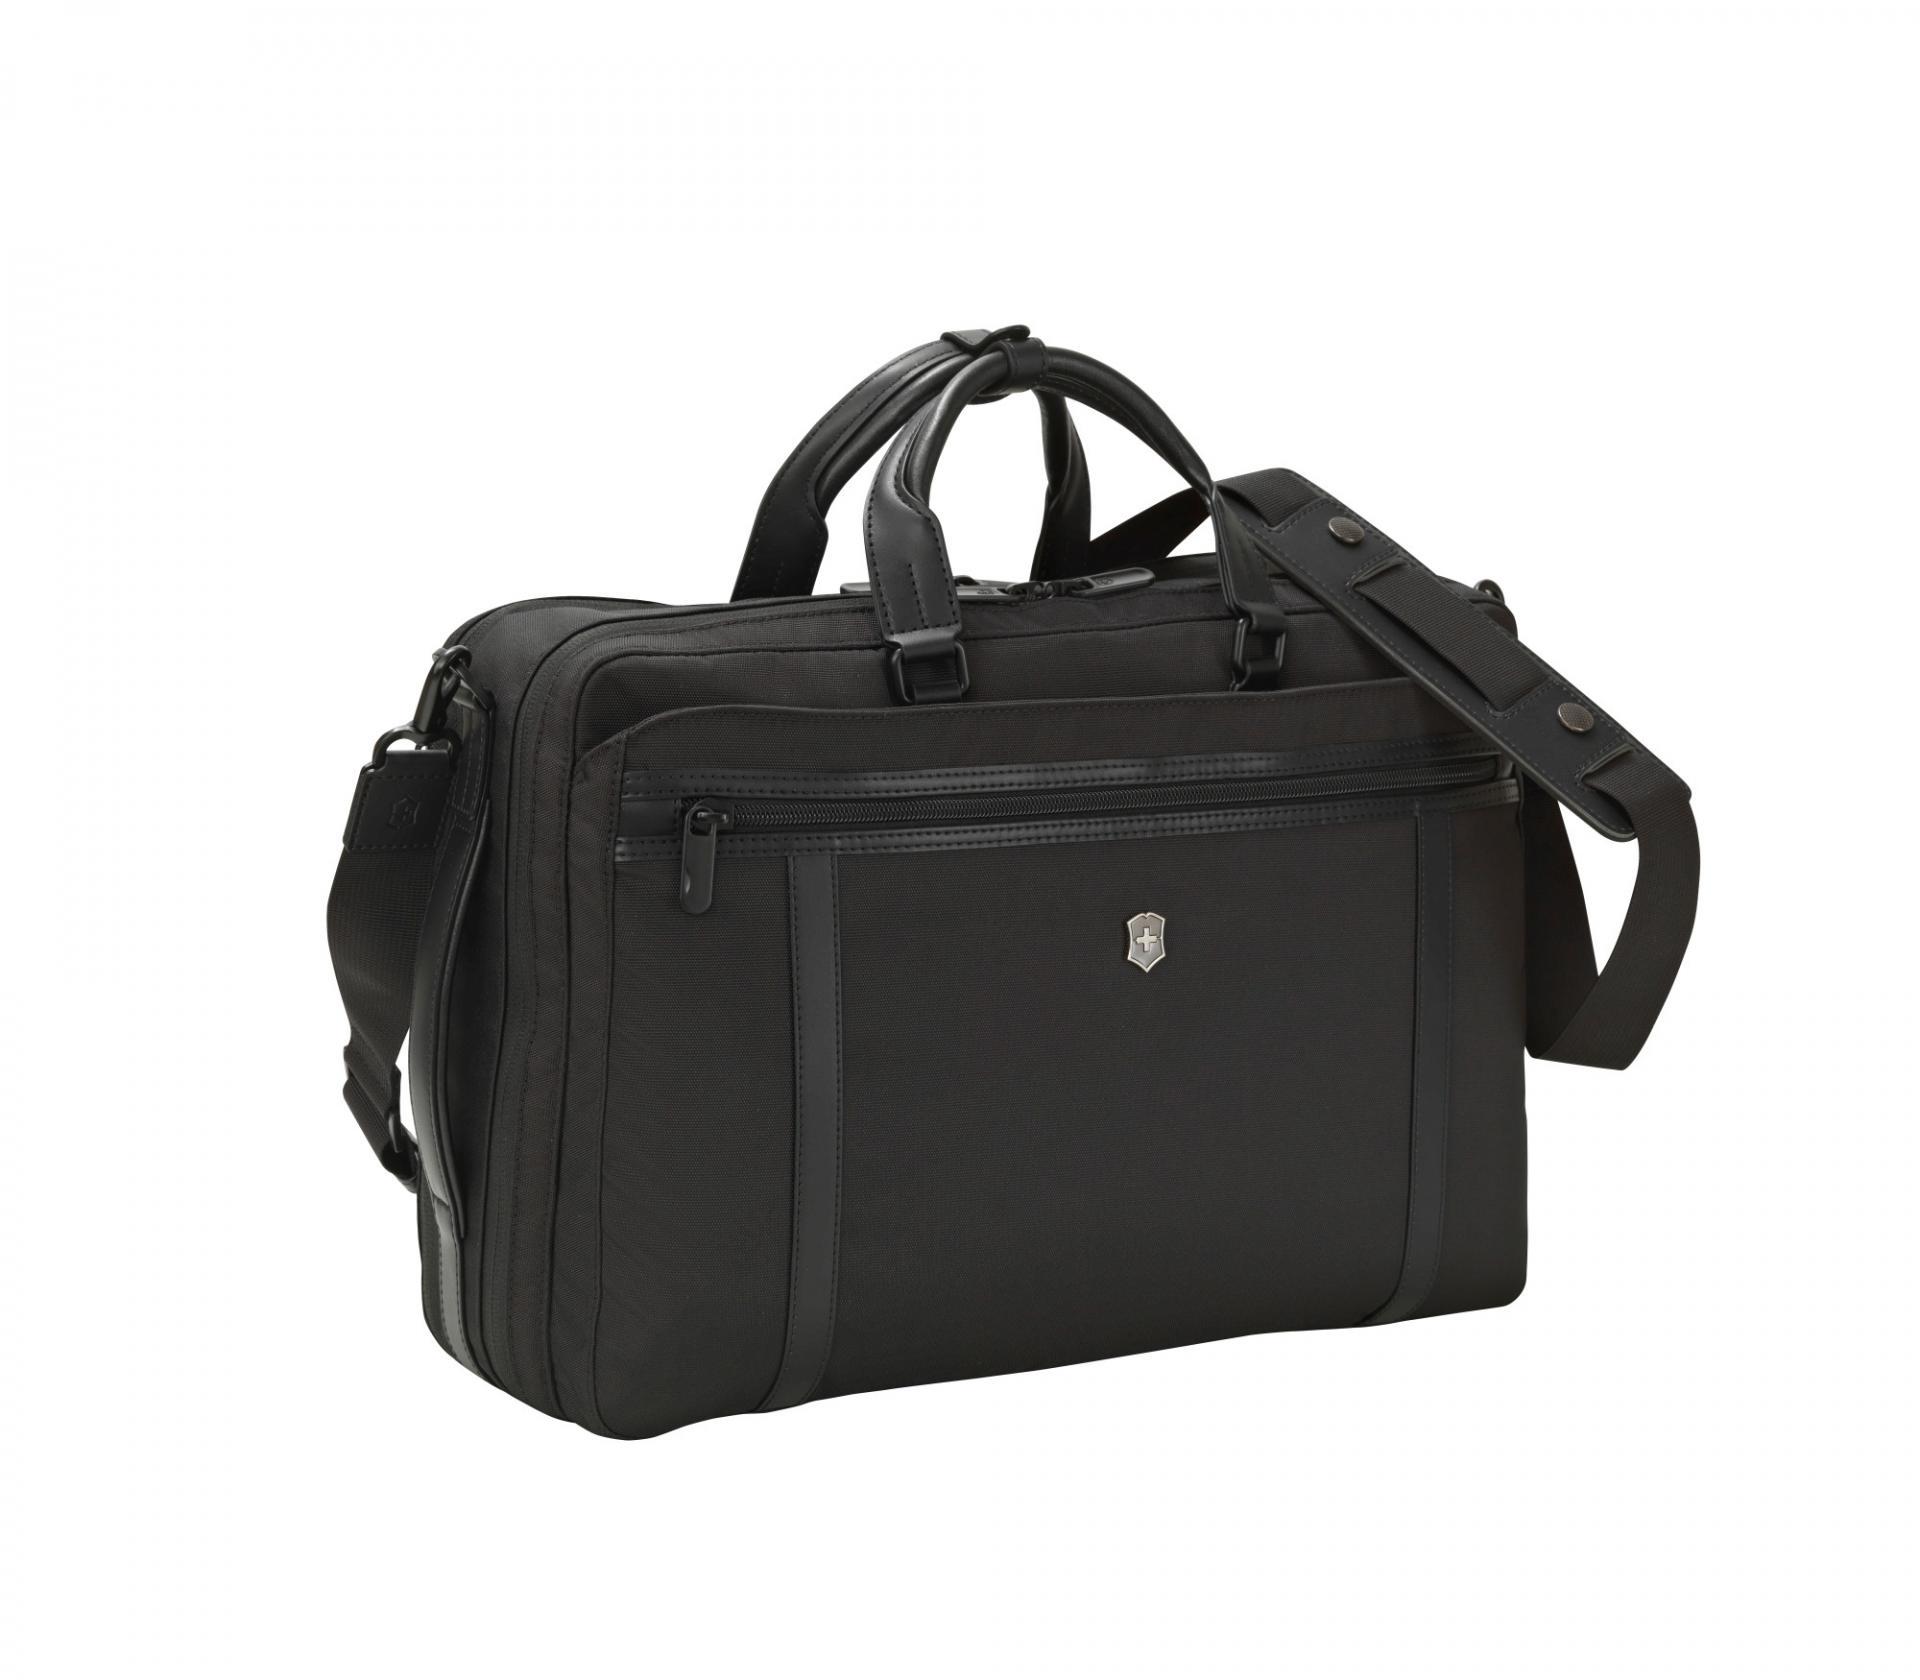 Maletin Victorinox Werks Professional 2.0, 2-Way Carry Laptop Bag 604987 *